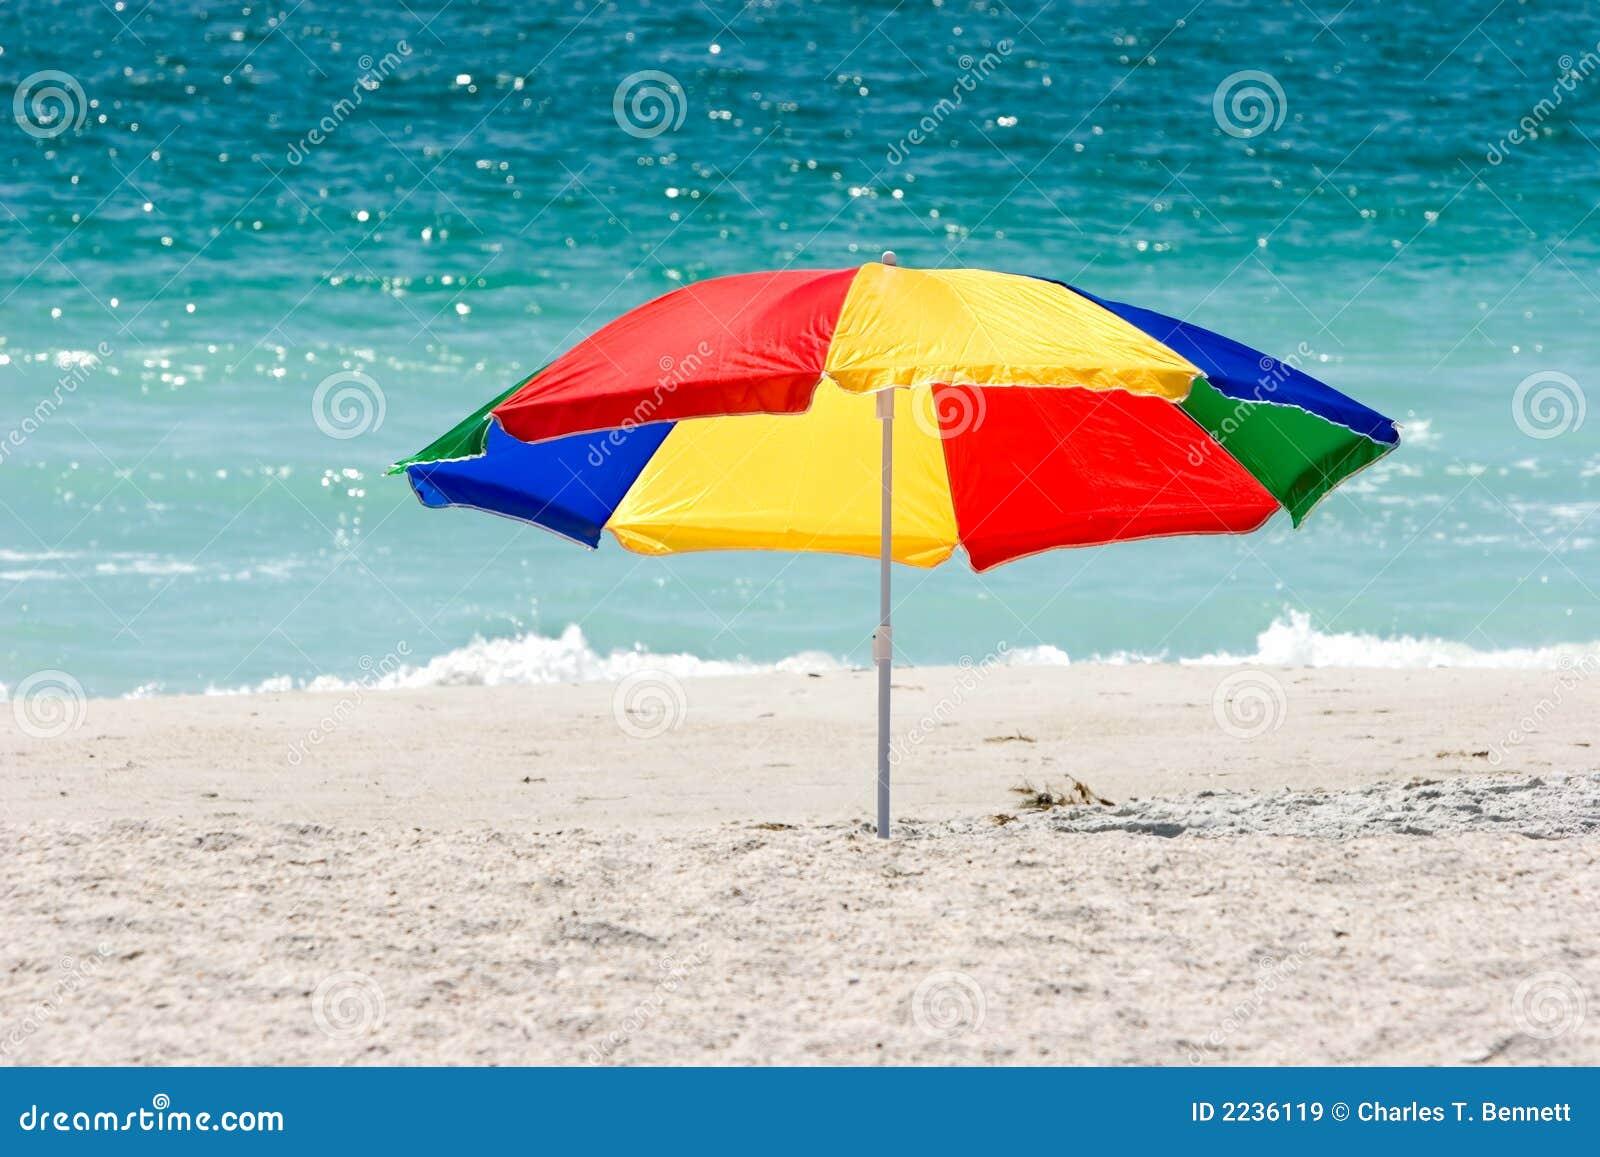 Colorful Beach Umbrella Royalty Free Stock Images - Image ... - photo#33